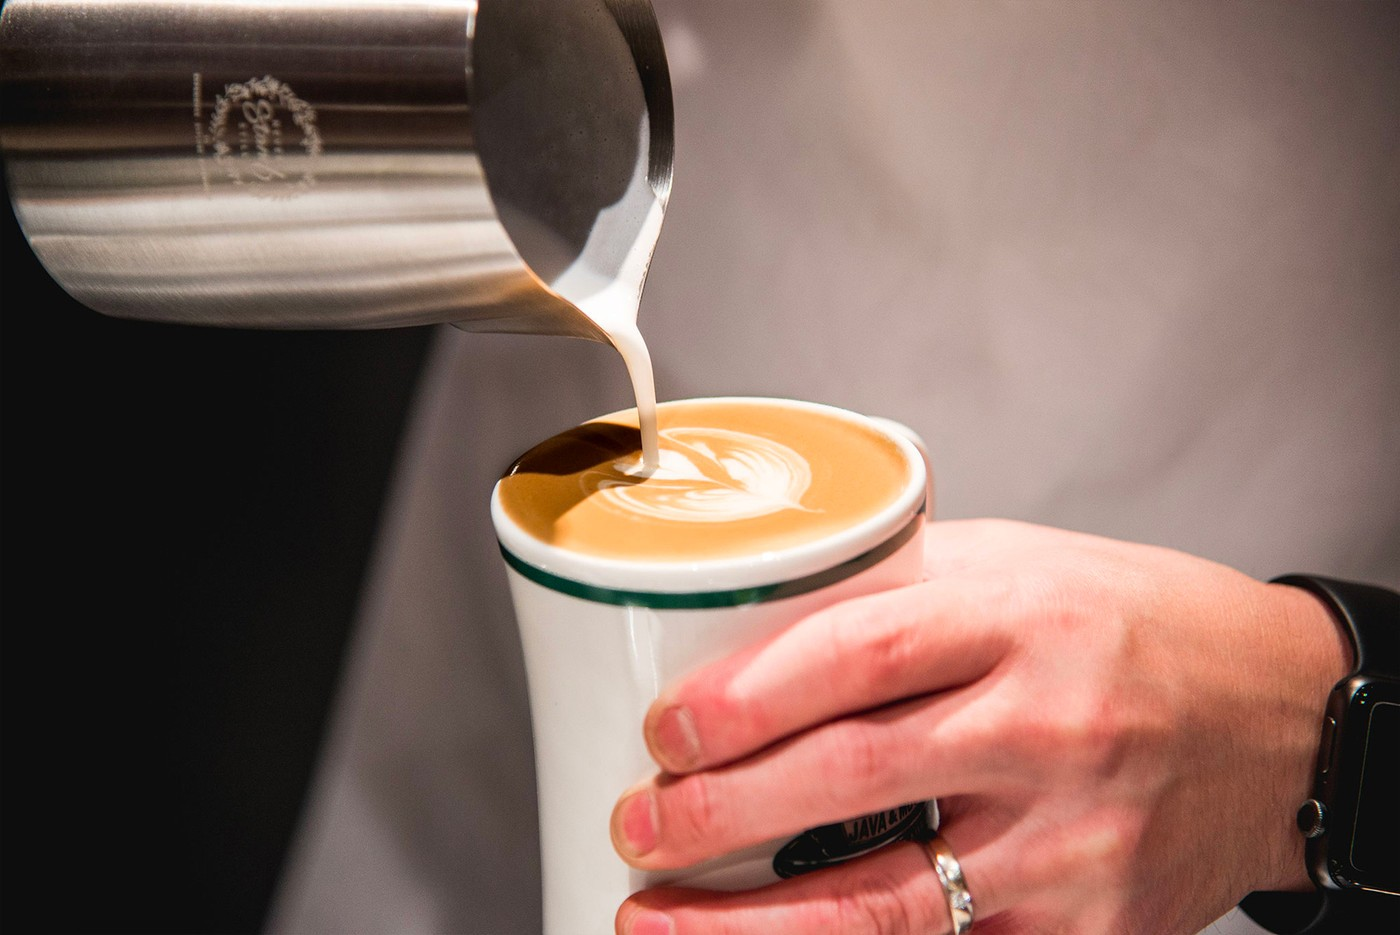 SUPREME RETAIL OFF-WHITE BUSINESS VIDEOS ACCESSORIES SONY SONY PLAYSTATION COFFEE WALLETHUB NATIONAL COFFEE DAY BATMAN ANARCHY WARNER BROS. THE BEATLES JOKER WILL SMITH SHUHEI NOMURA JOAQUIN PHOENIX JOHN WICK 3 2019 KEANU REEVES YESTERDAY GEMINI MAN